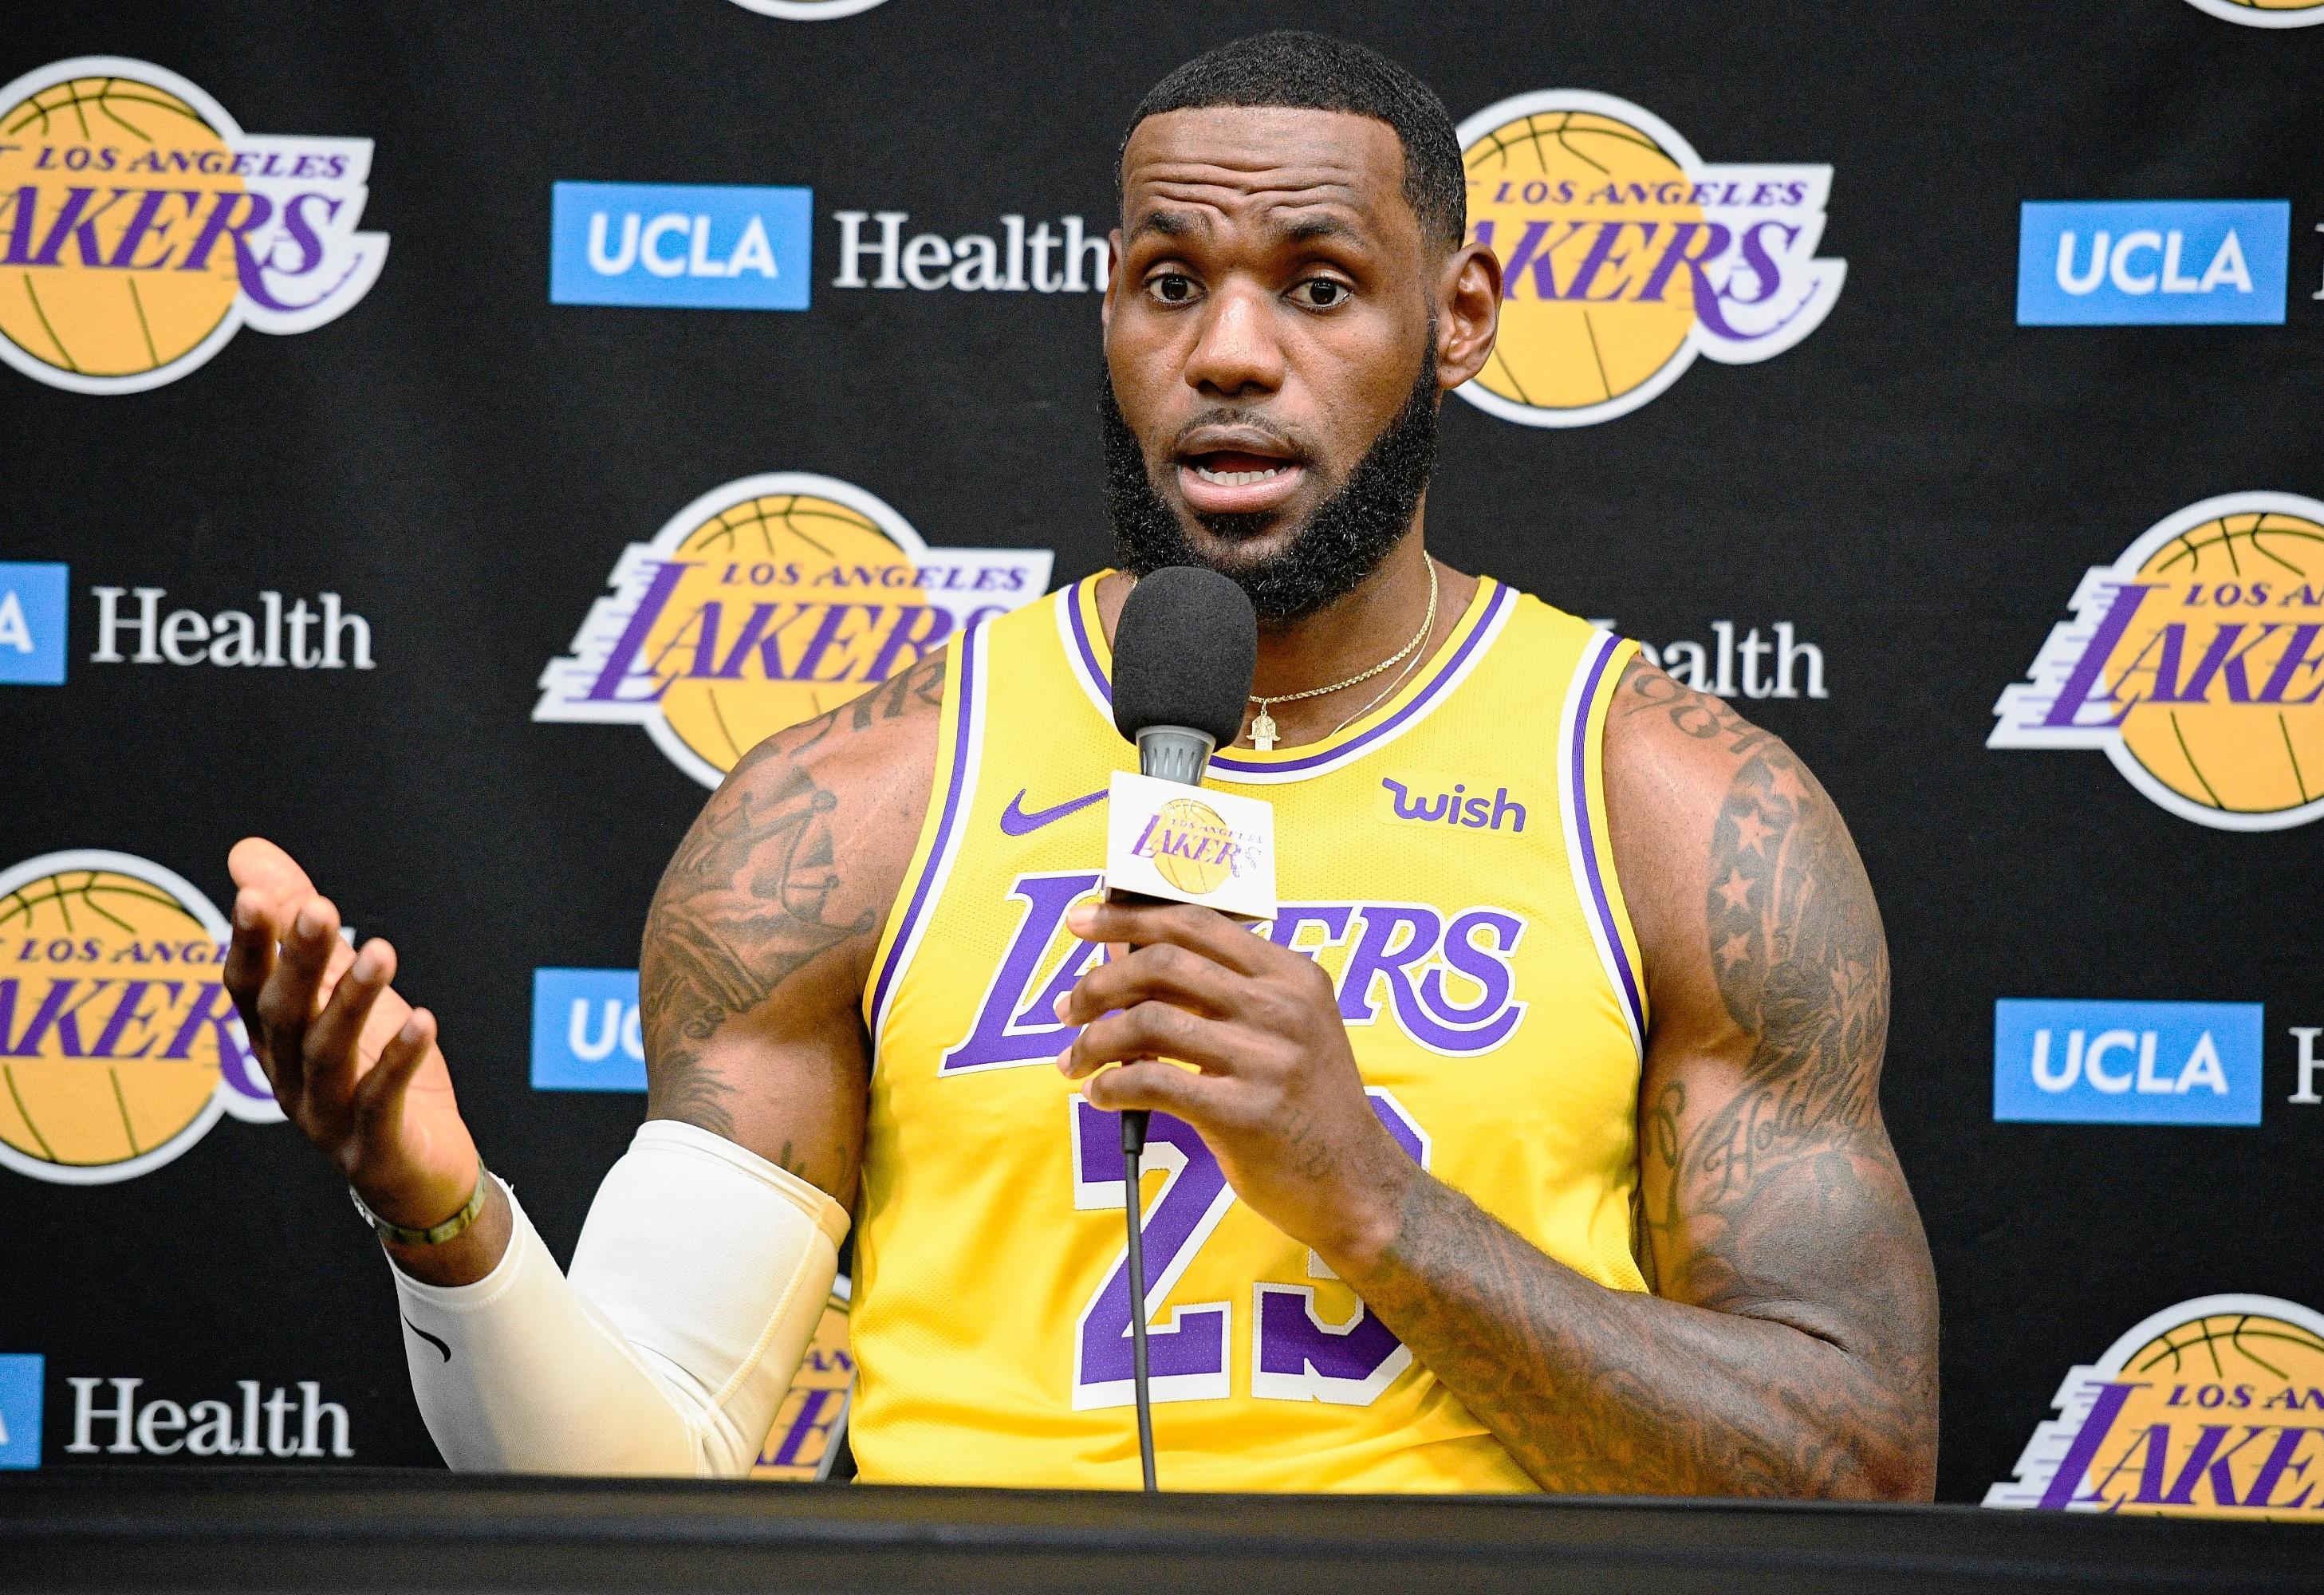 "NBA湖人球星""小皇帝""詹姆斯因为说莫雷""没做功课""发推文的评论,将自己推上风口浪尖,遭美媒和网民""围剿""。-路透社-"